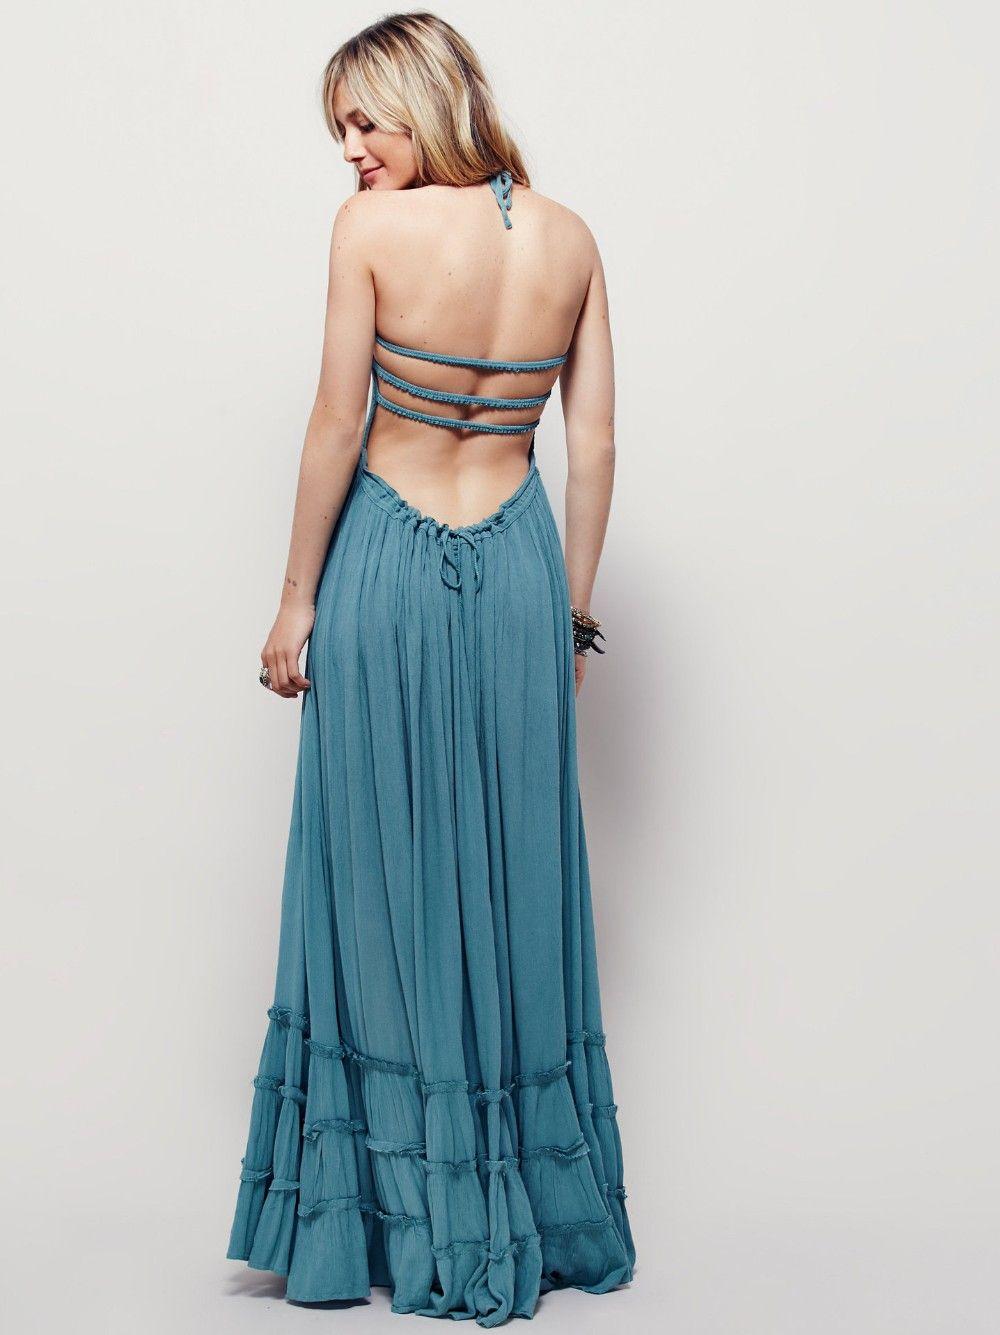 2017 Summer Beach Dress Bohème De Vacances Longue Dos Nu Sexy Dress Femmes Parti Hippie Robes Maxi Dress